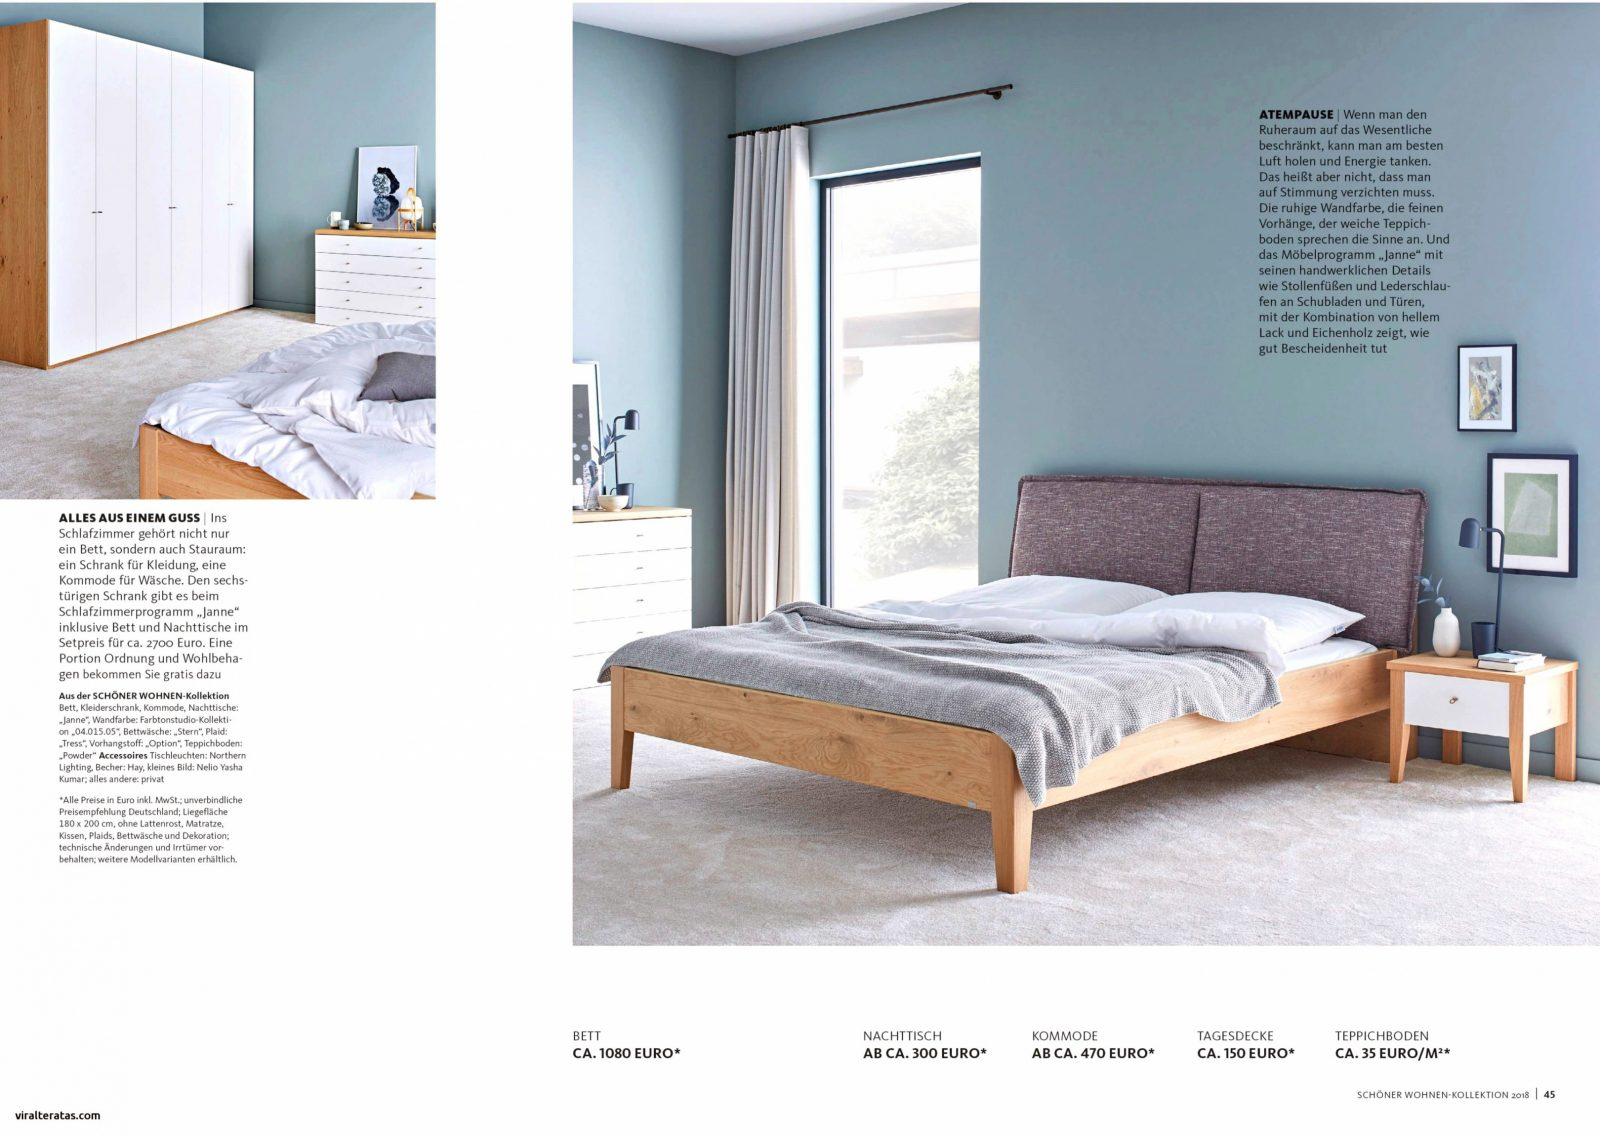 Neu Stauraum Ideen Schlafzimmer Ikea  Sitzbank Mit Stauraum von Stauraum Ideen Schlafzimmer Bild